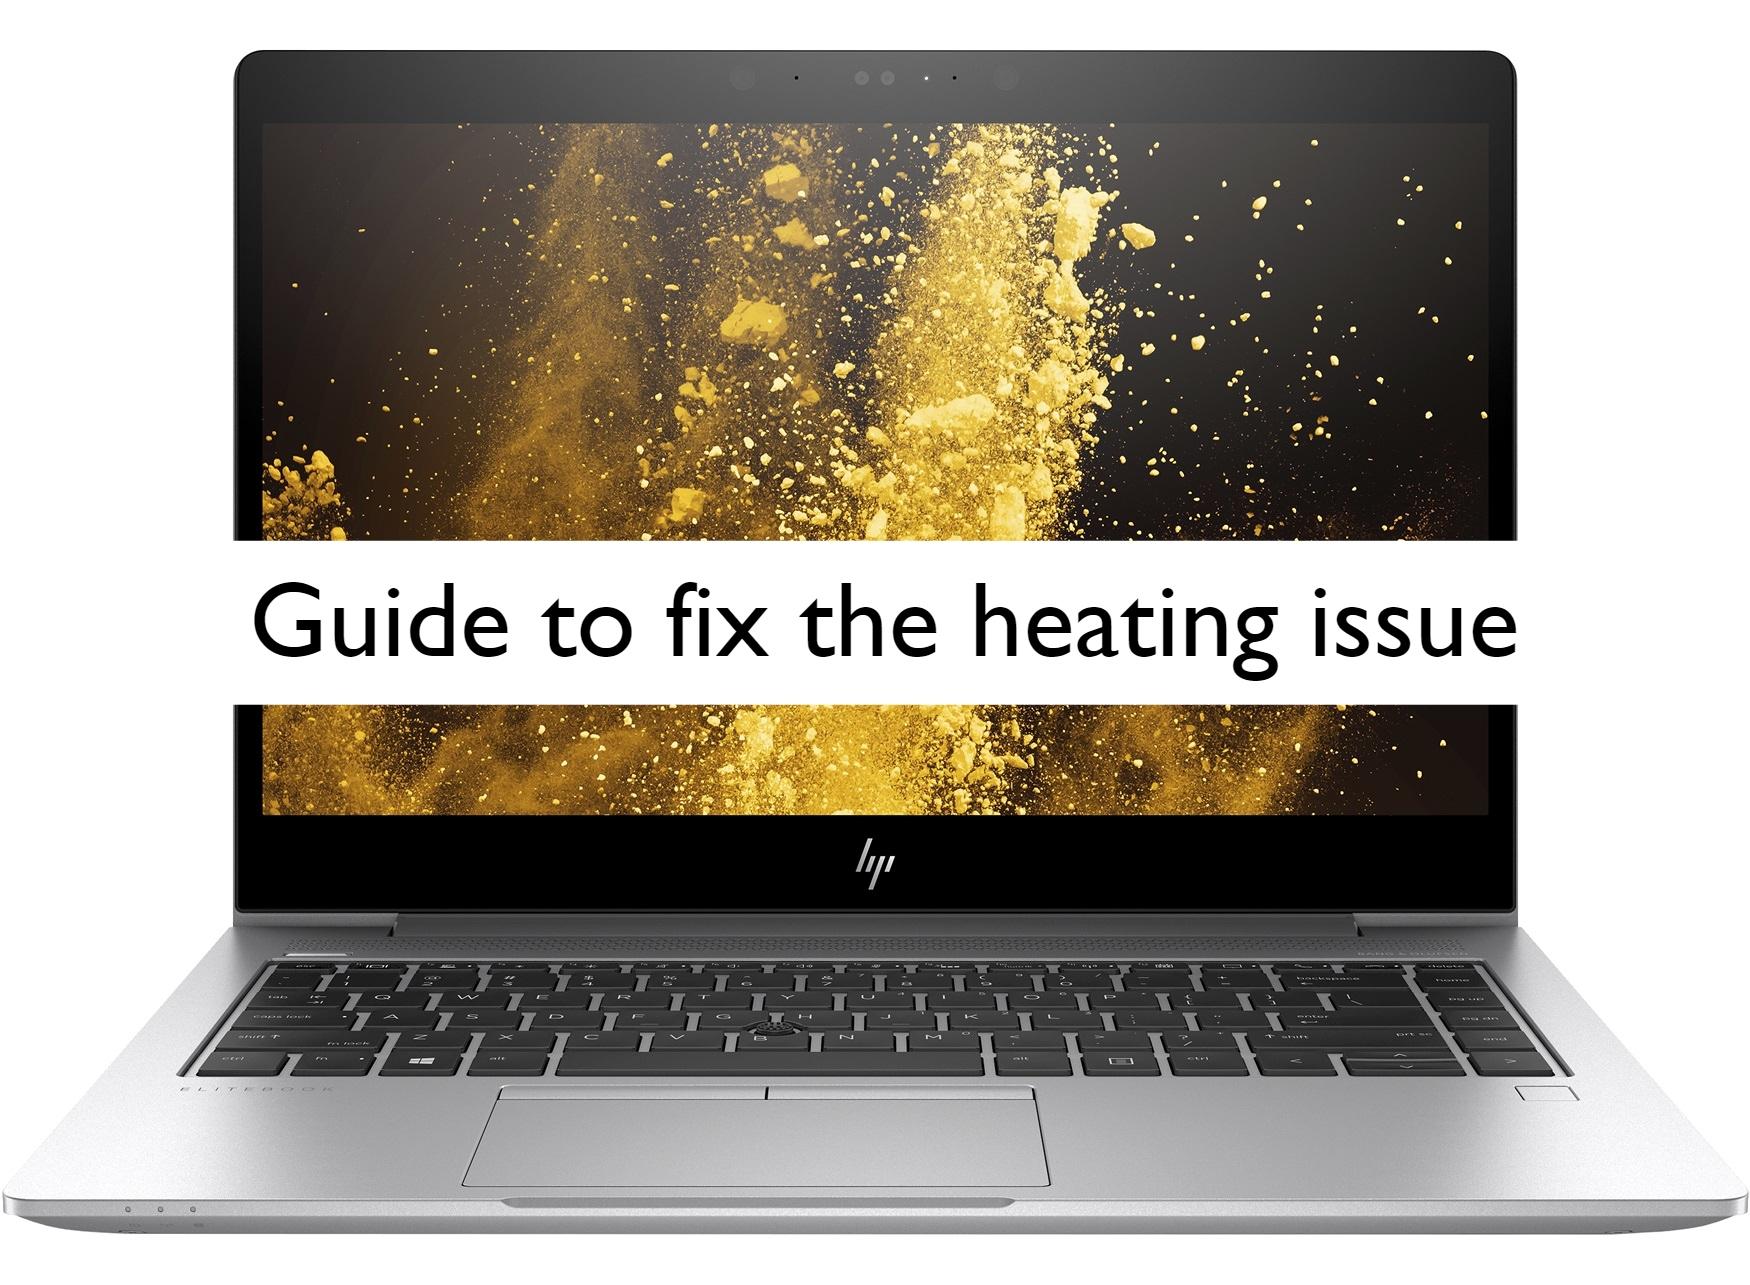 HP Elitebook 840 overheating